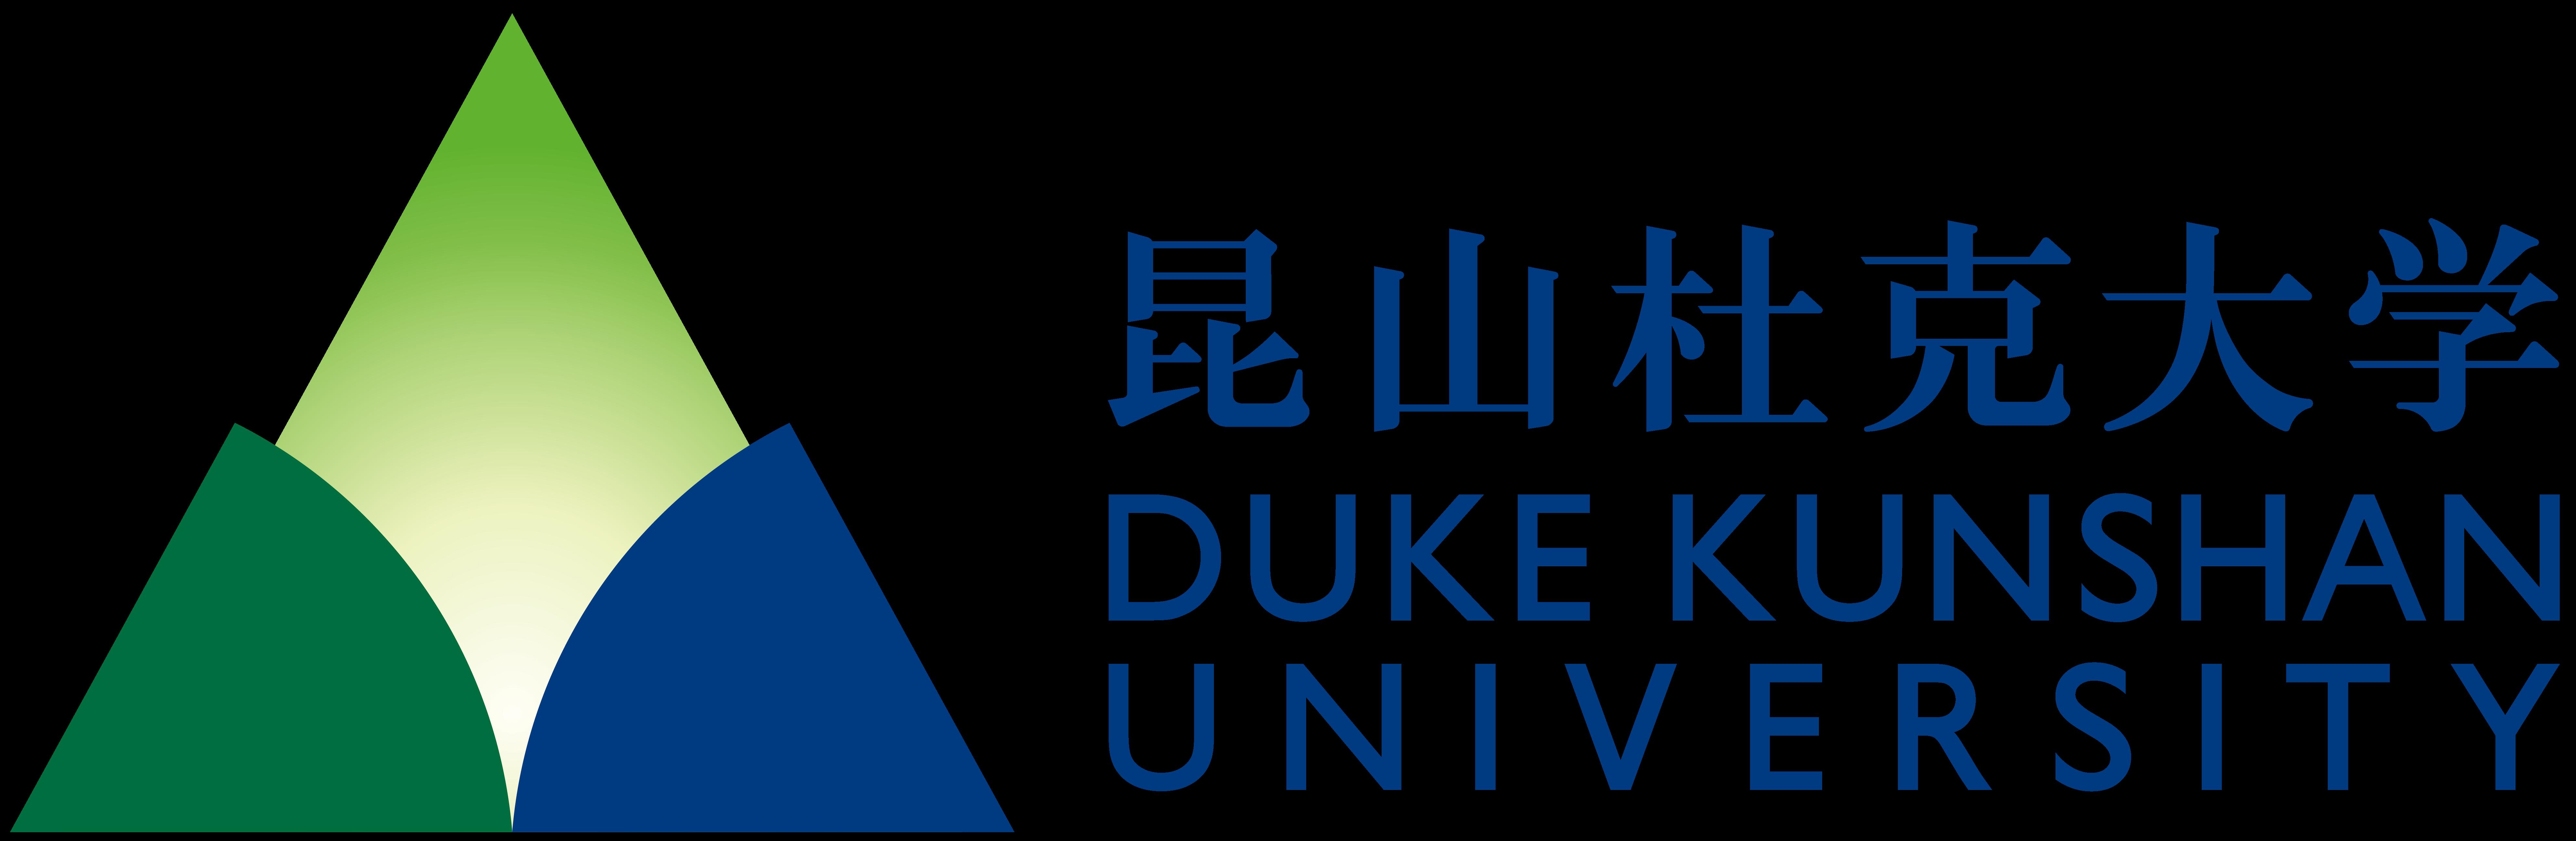 Duke Kunshan University ahti partner